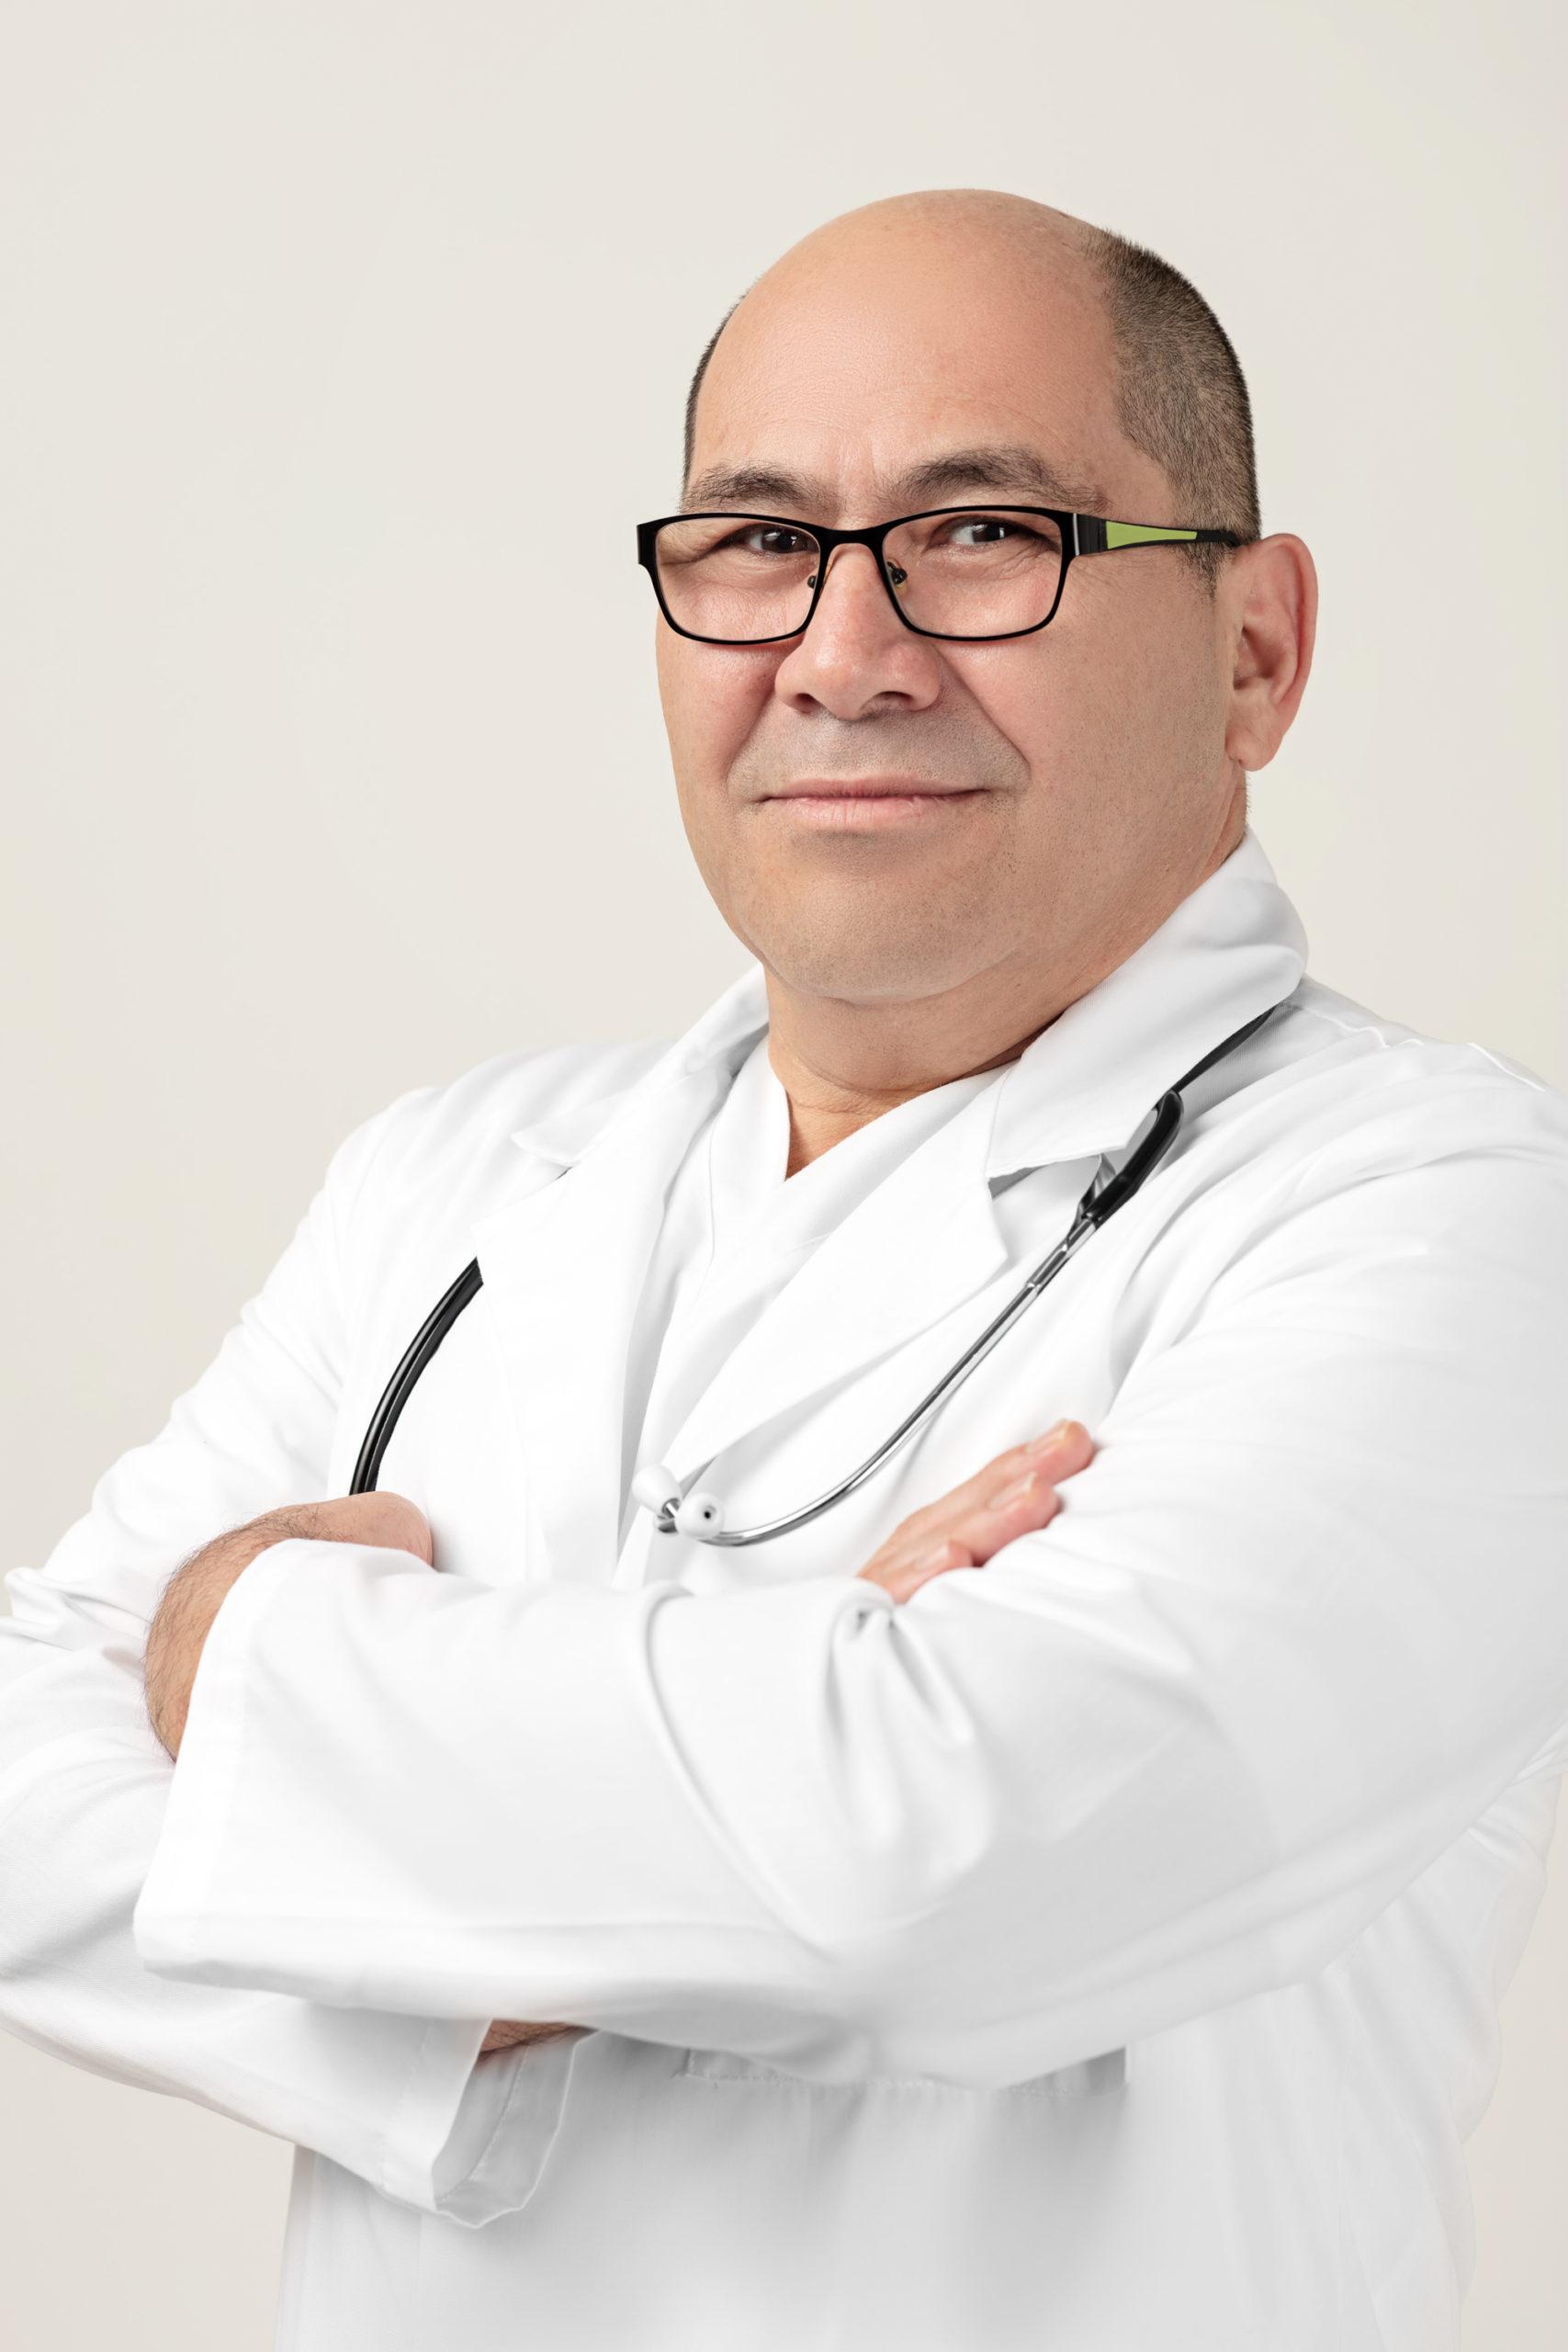 Dr. Miguel Gutierrez Pineda